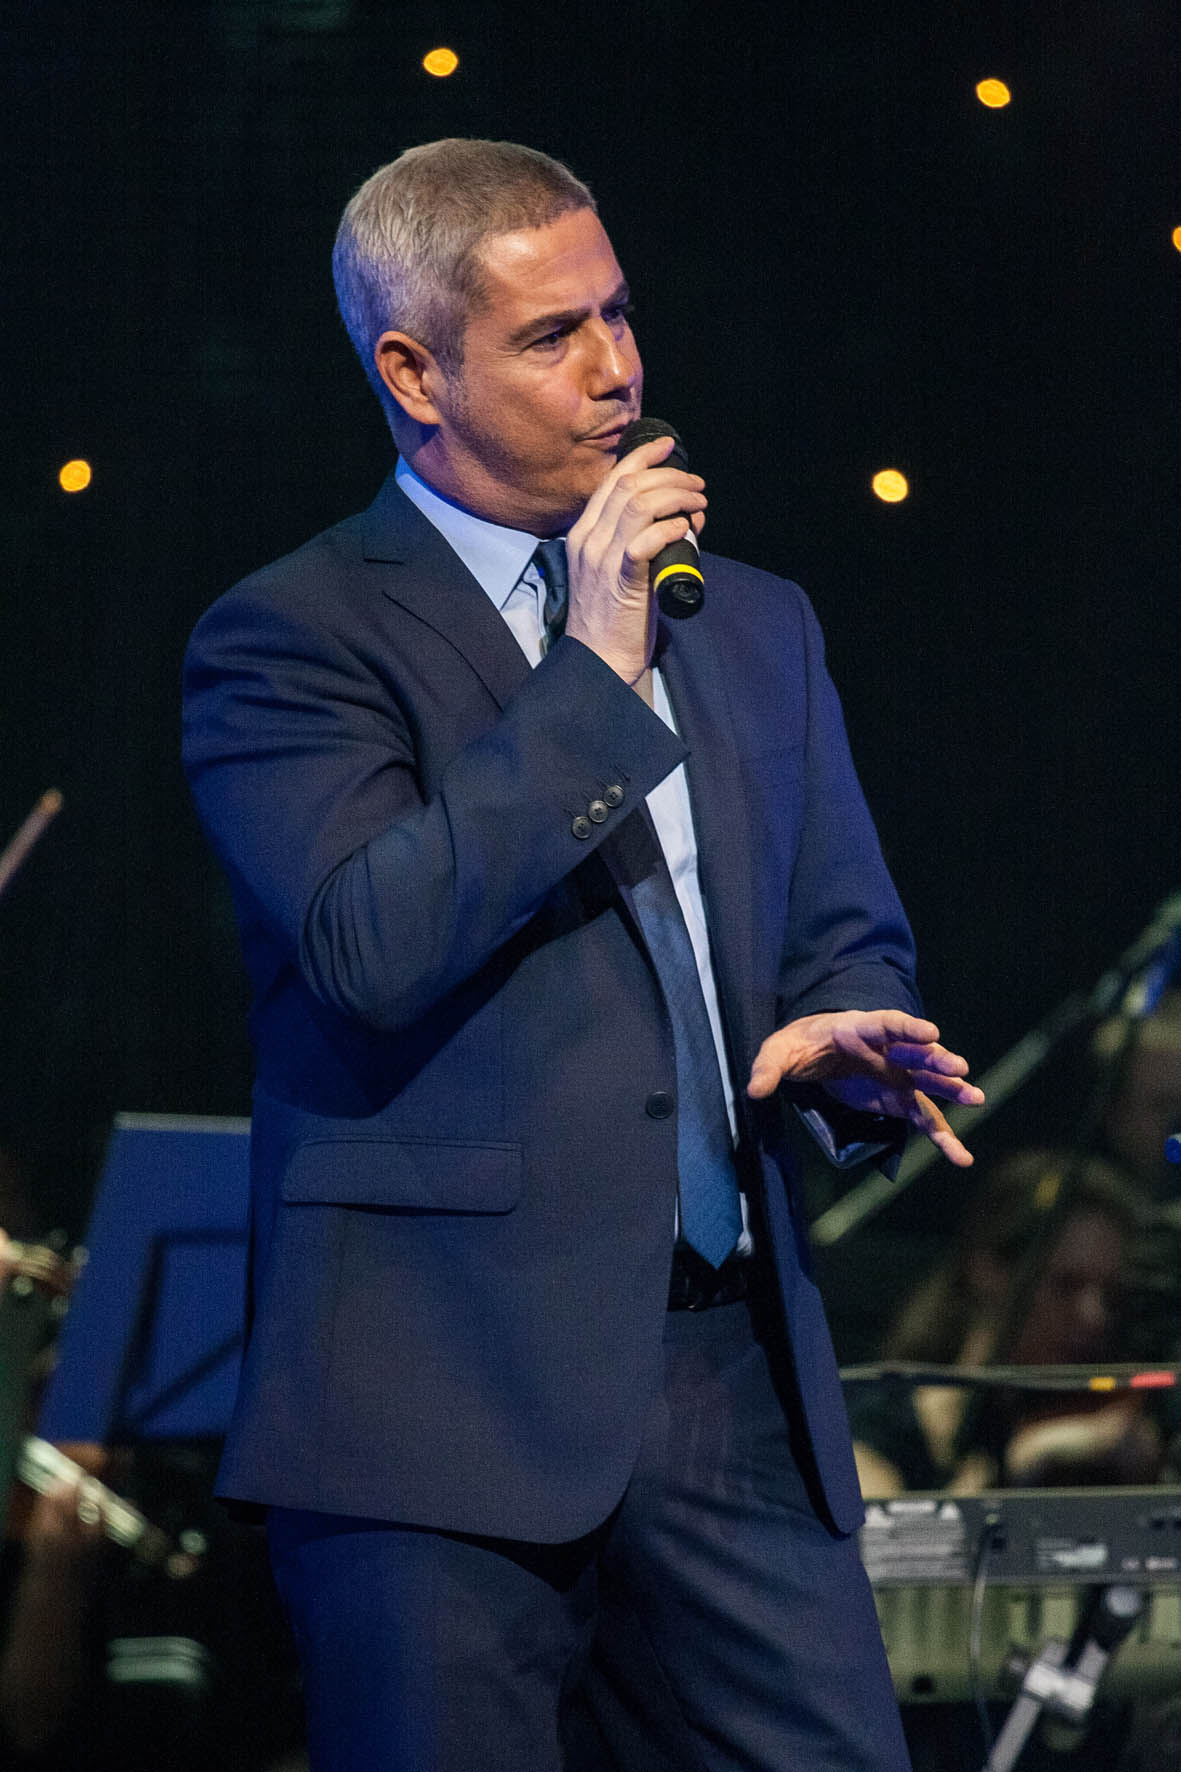 Концерт Алессандро Сафина в Киеве состоится 6